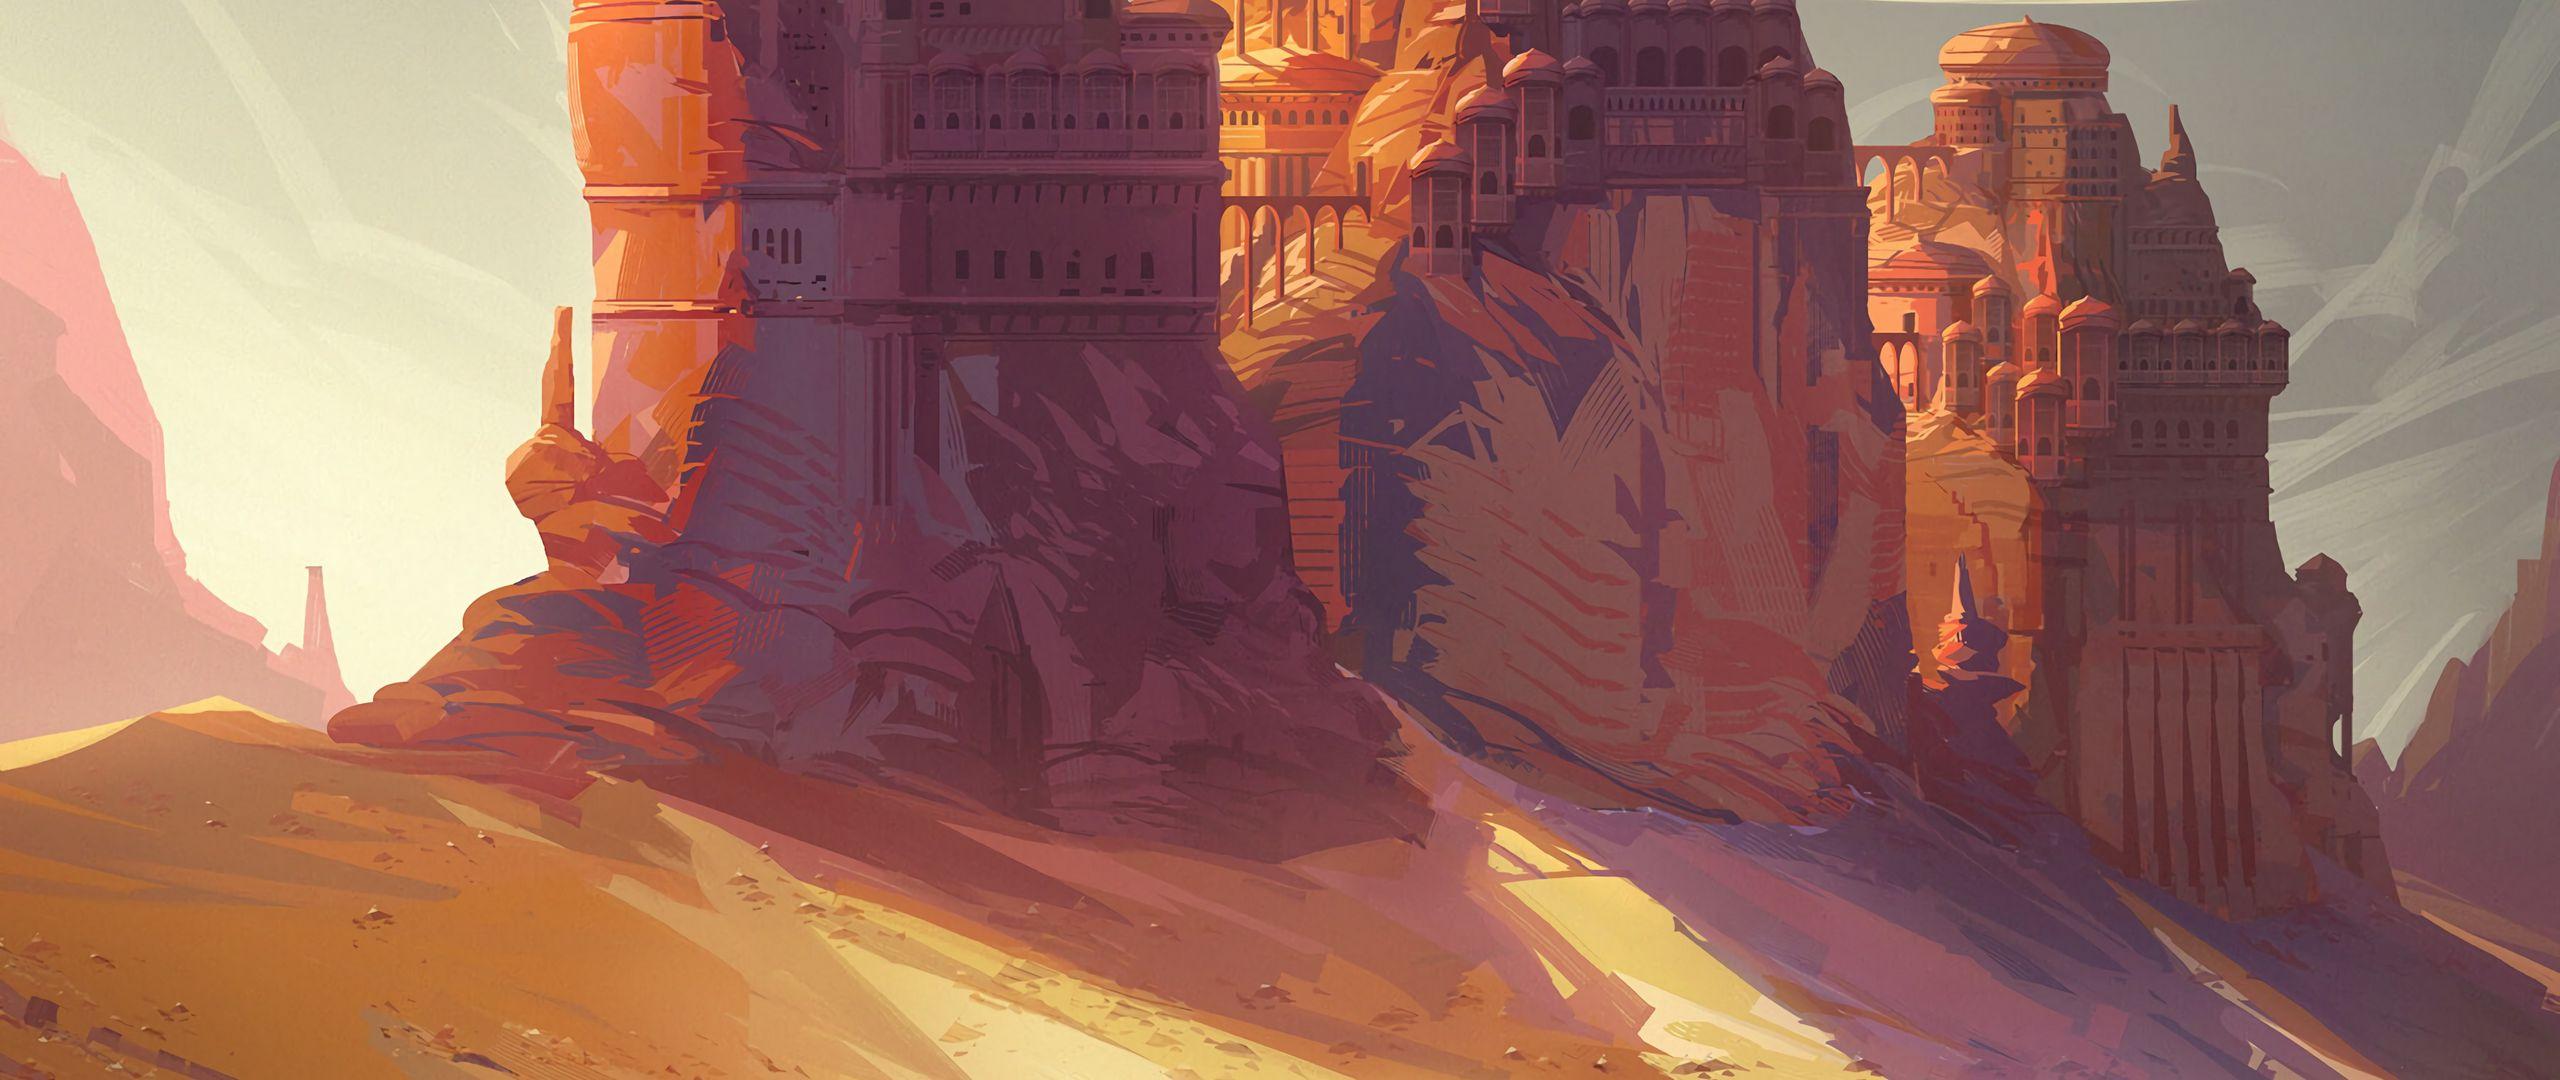 2560x1080 Wallpaper friends, adventure, castle, art